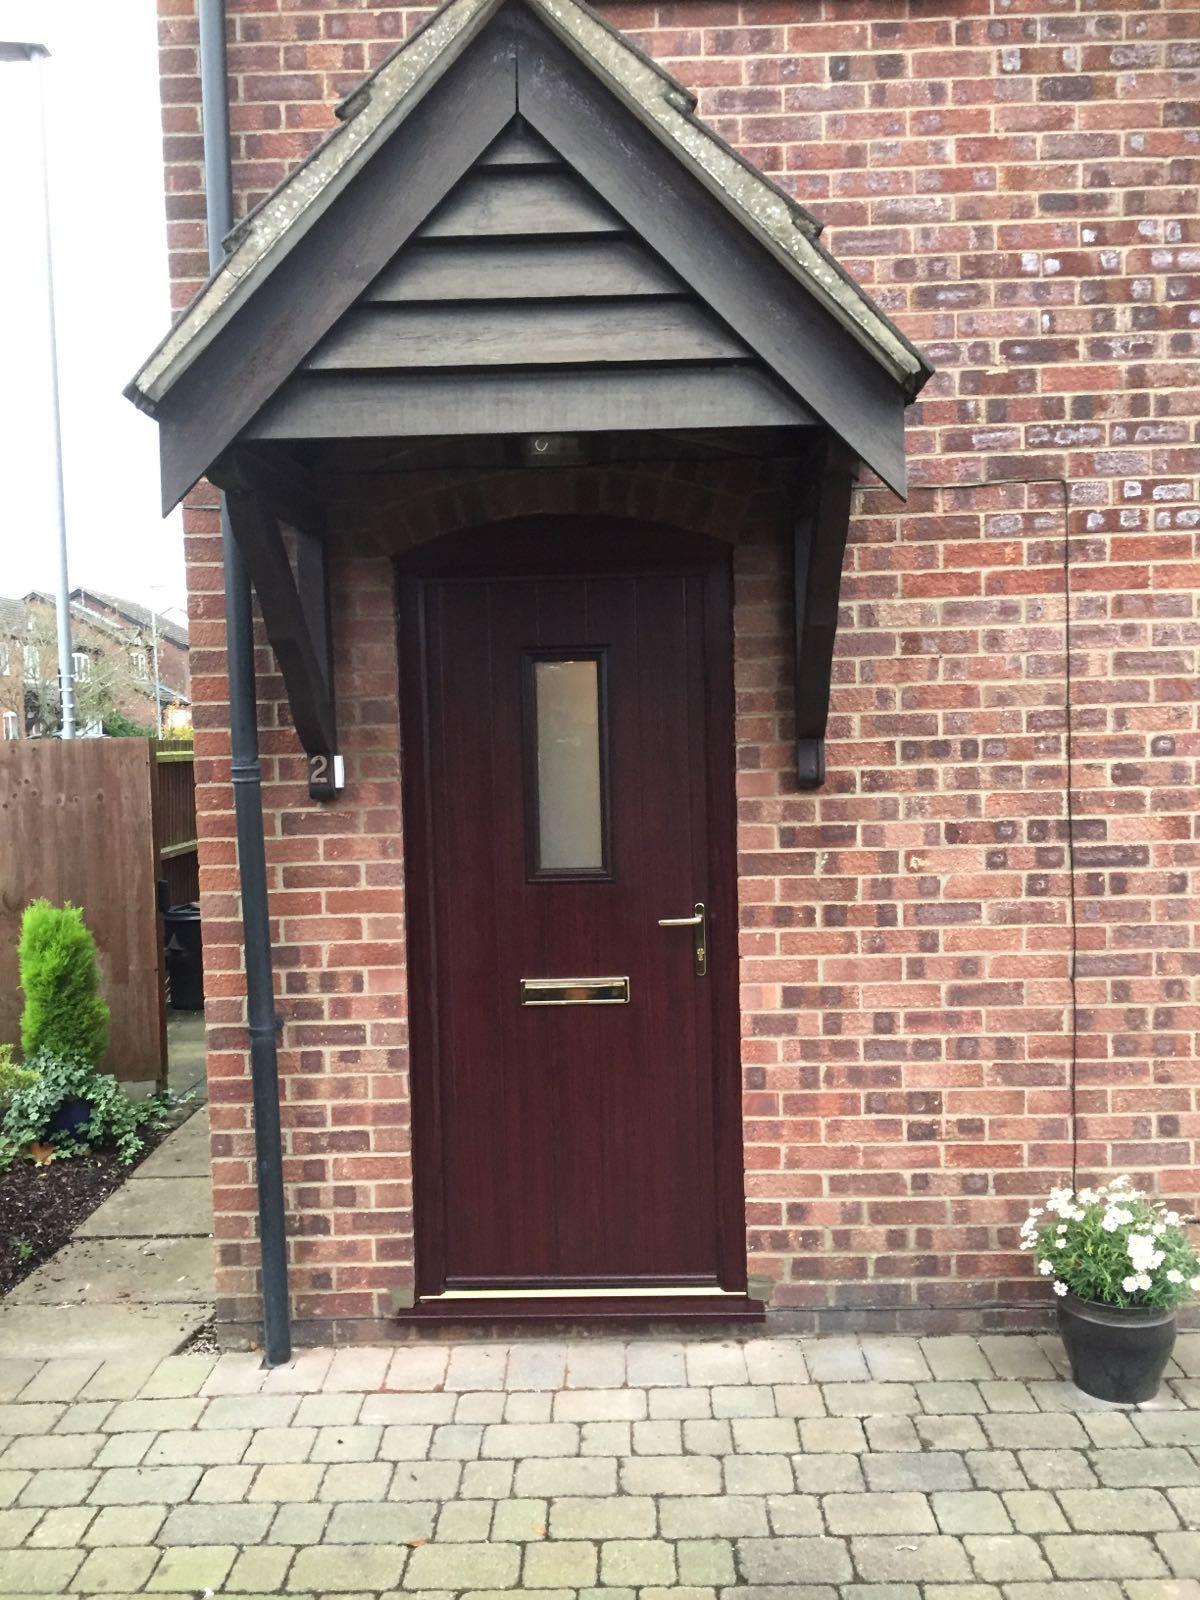 Endurance Doors - Malvern - Rosewood & Endurance Doors - Malvern - Rosewood | Front doors | Pinterest pezcame.com